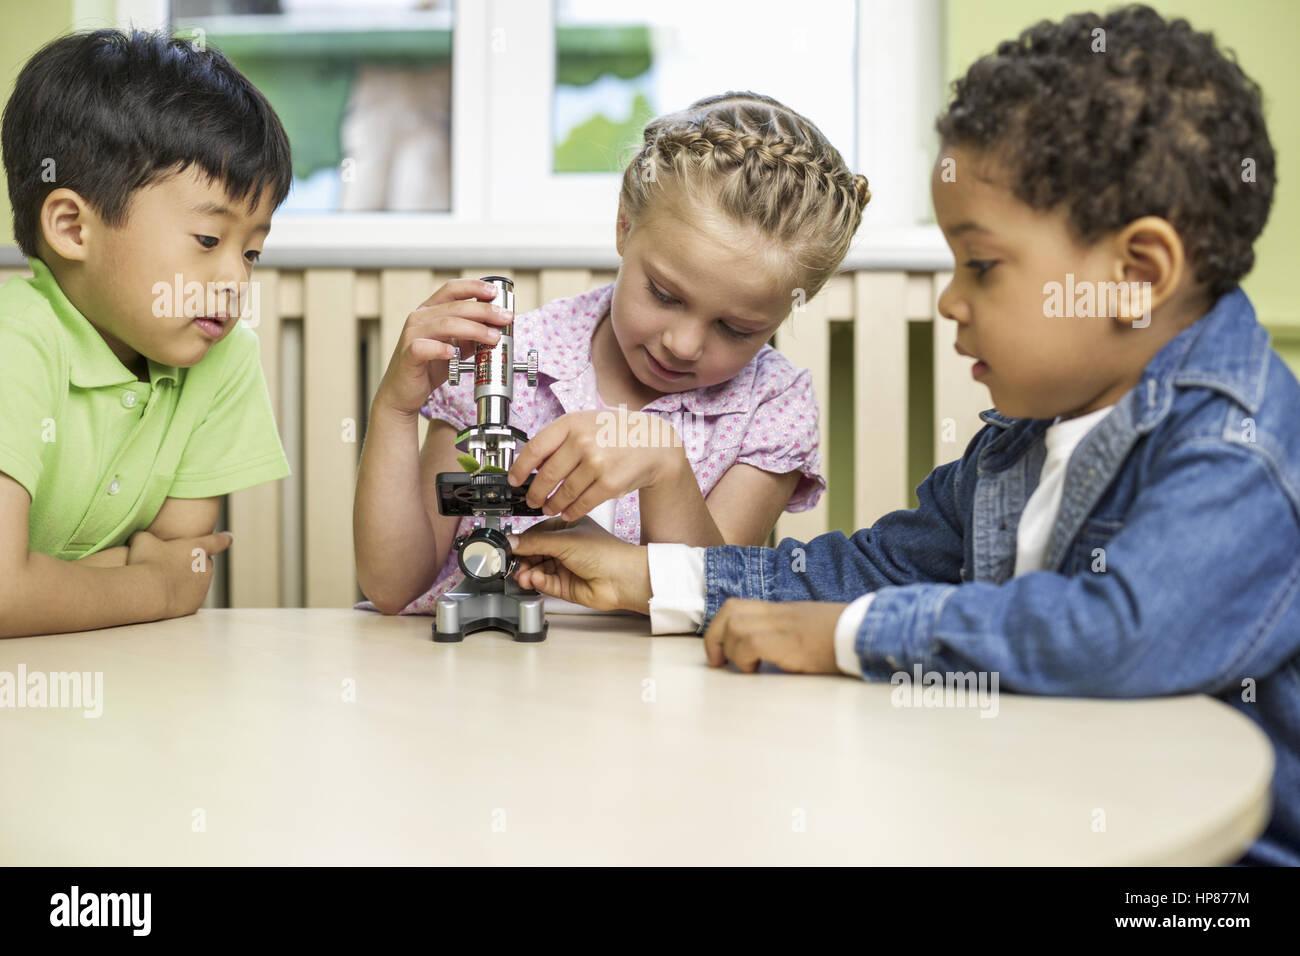 Drei kinder experimentieren mit einem mikroskop model released